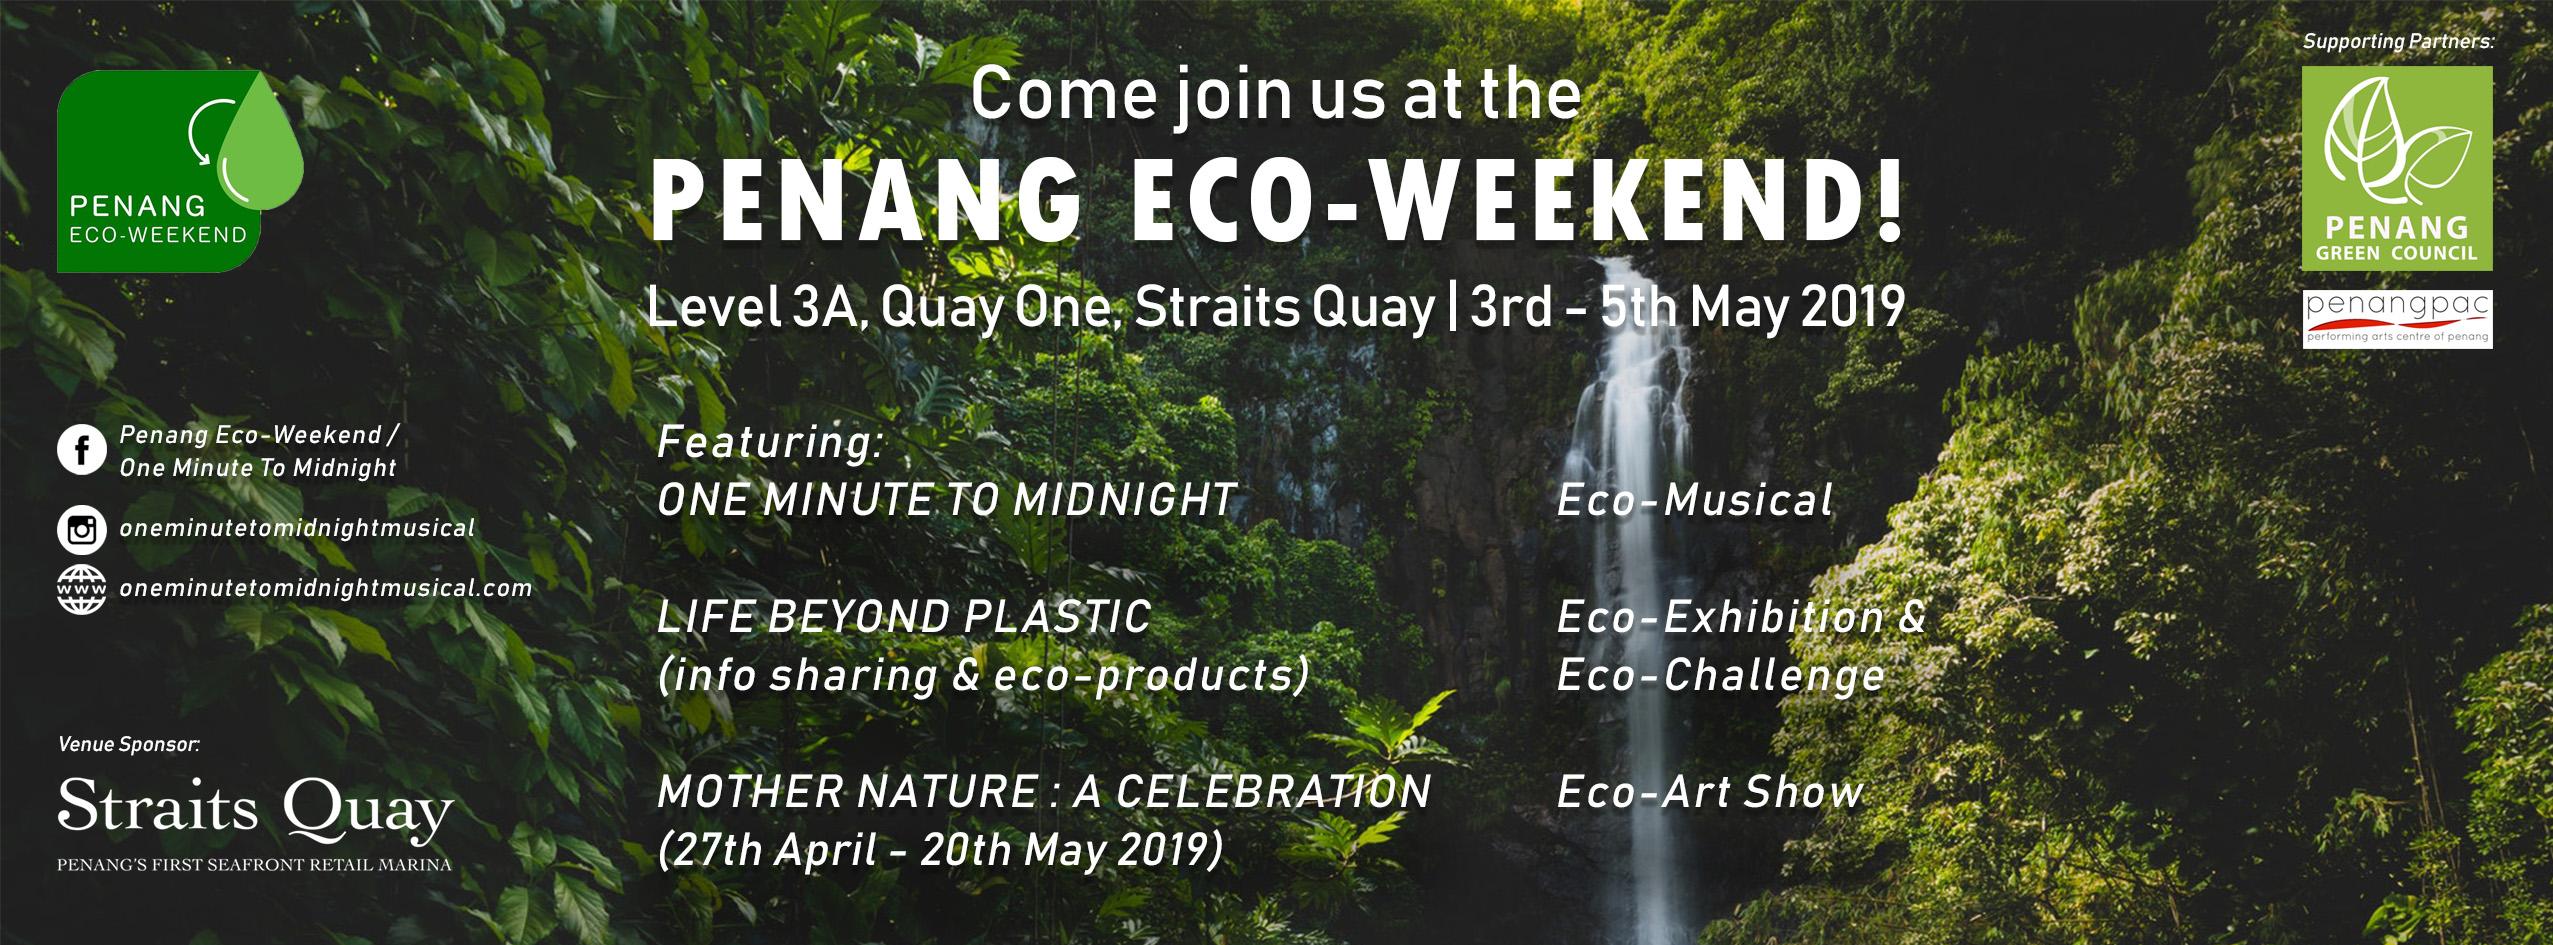 eco-weekend-banner-final